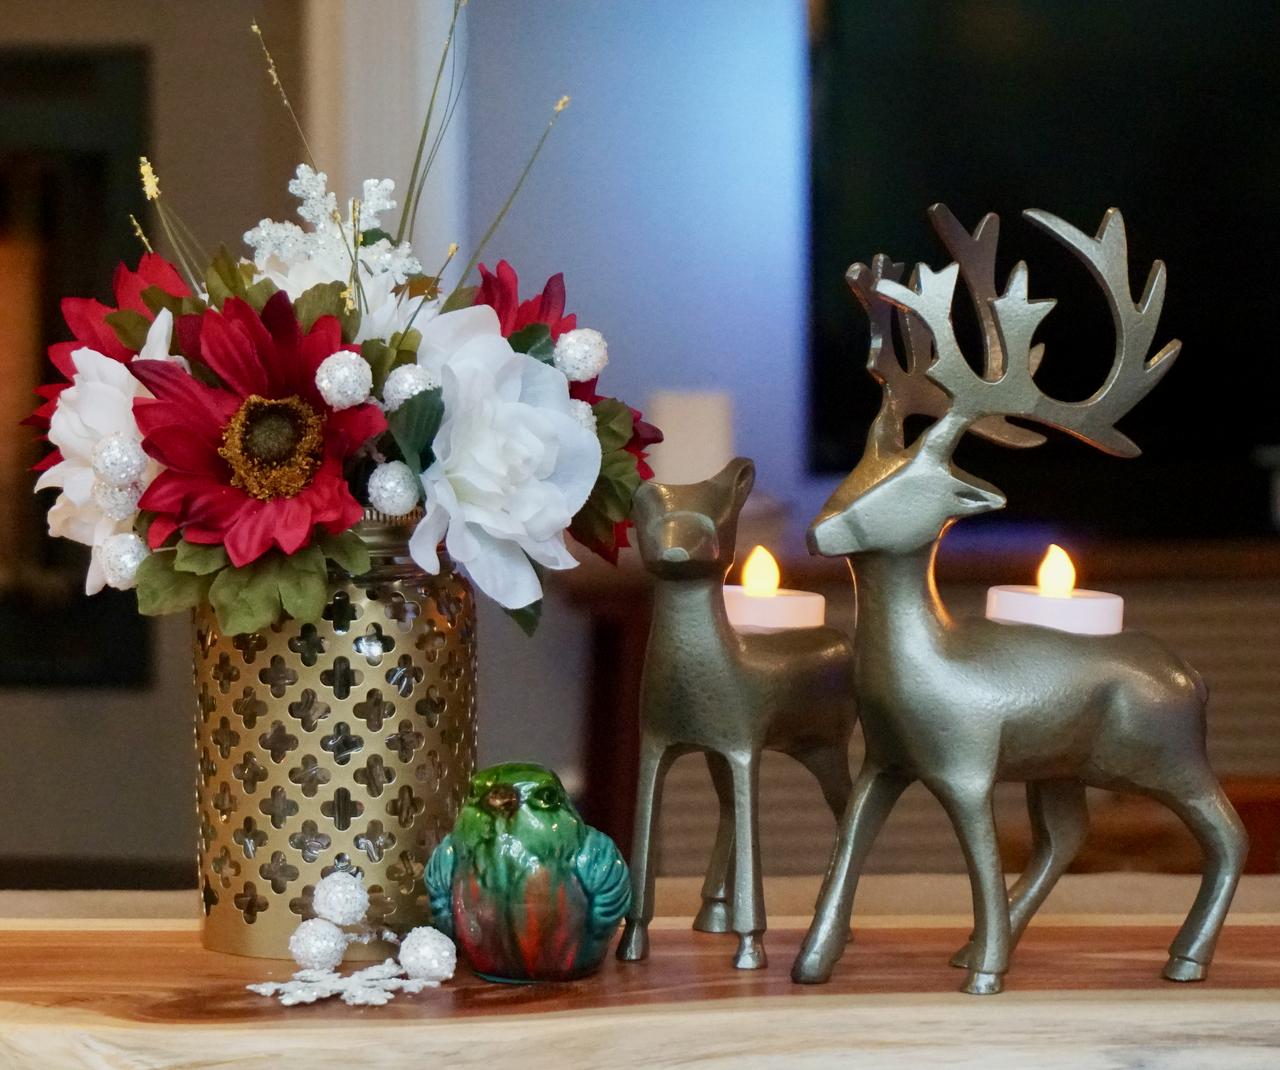 How to Make a Mason Jar Floral Arranger